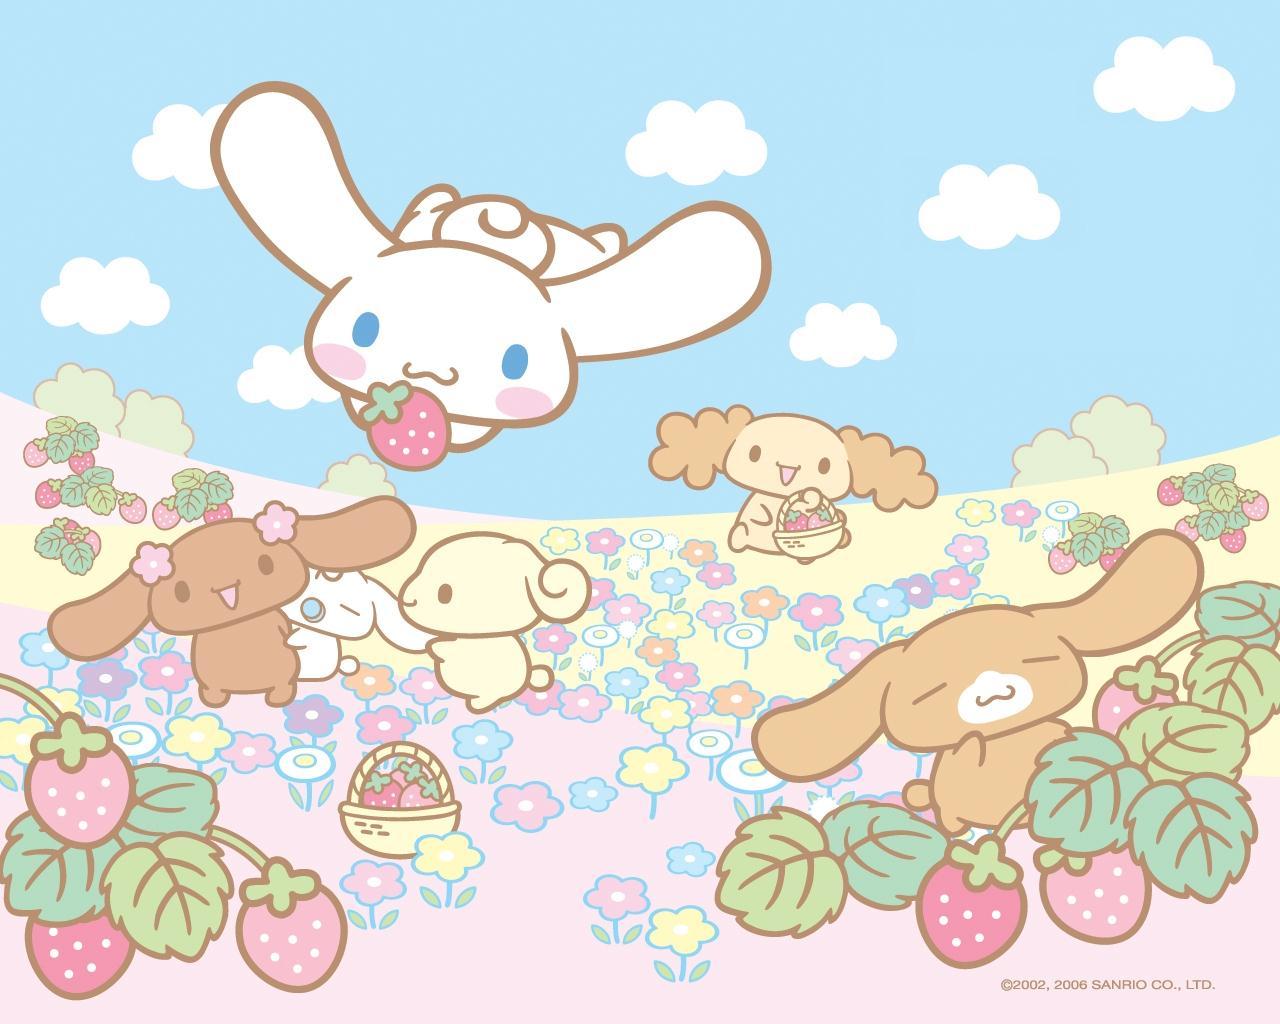 Sanrio Desktop Wallpapers Top Free Sanrio Desktop